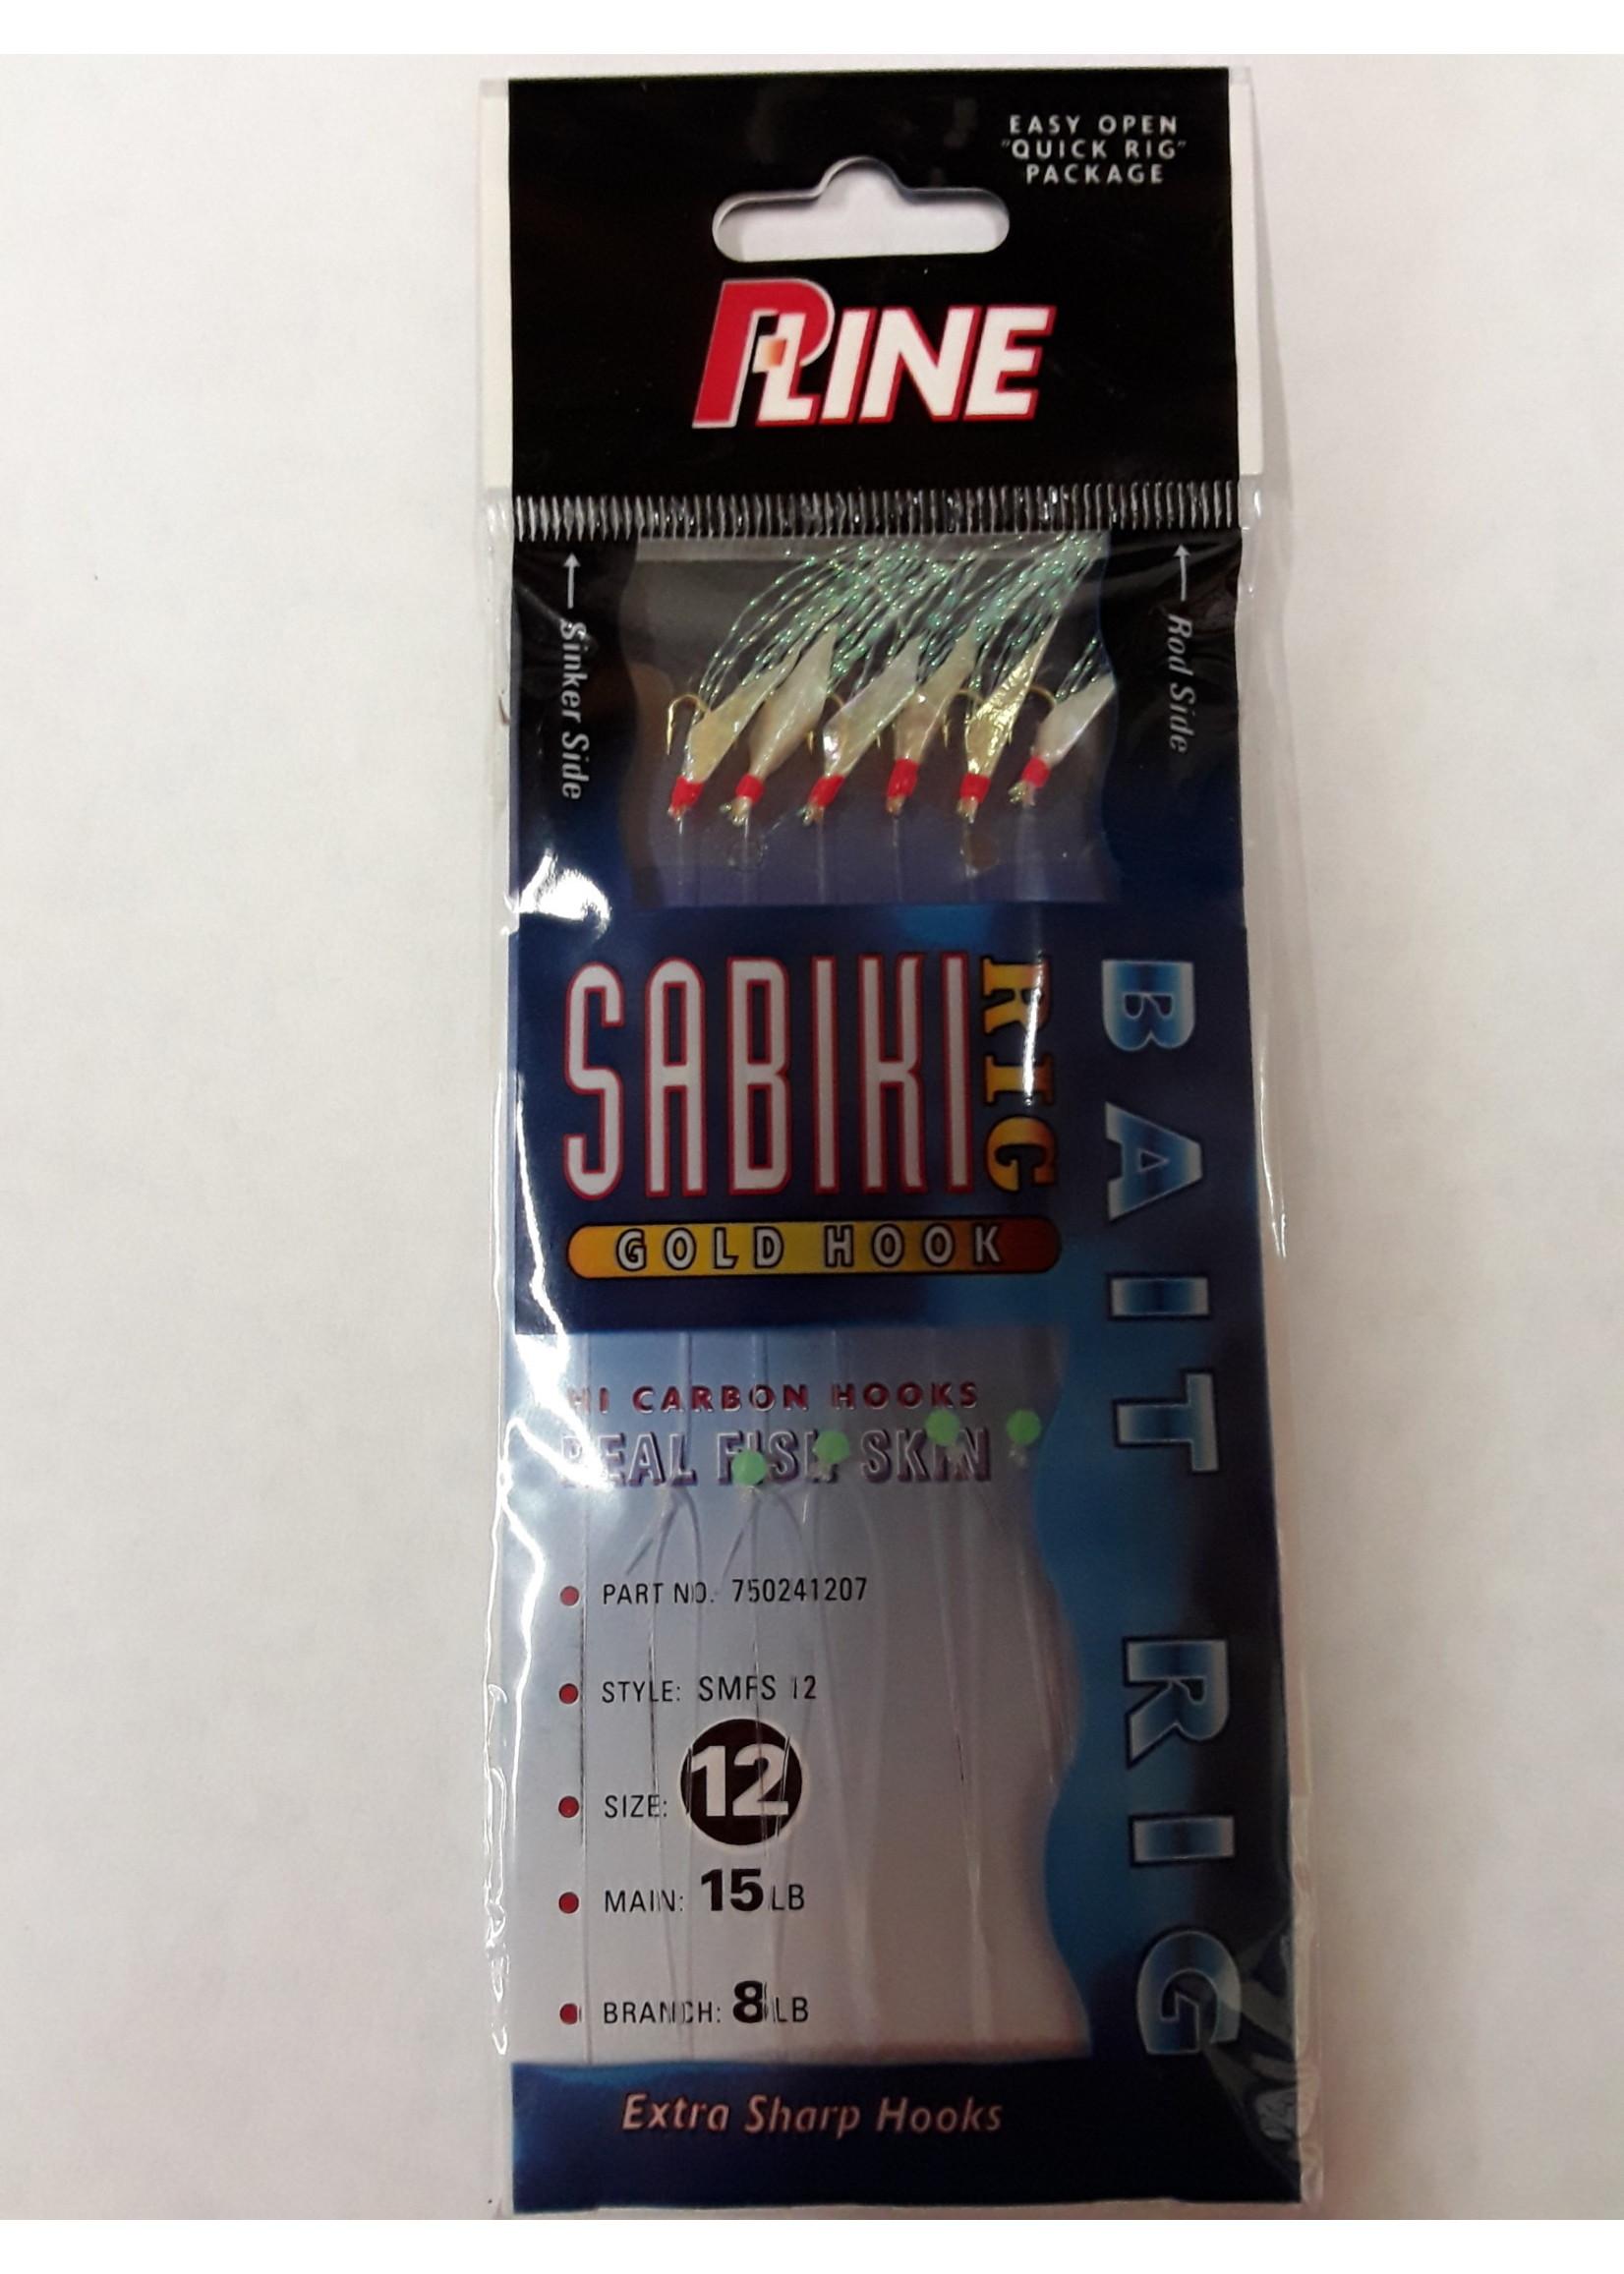 P-LINE P-Line Sabiki Hage Fish Skin Mylar